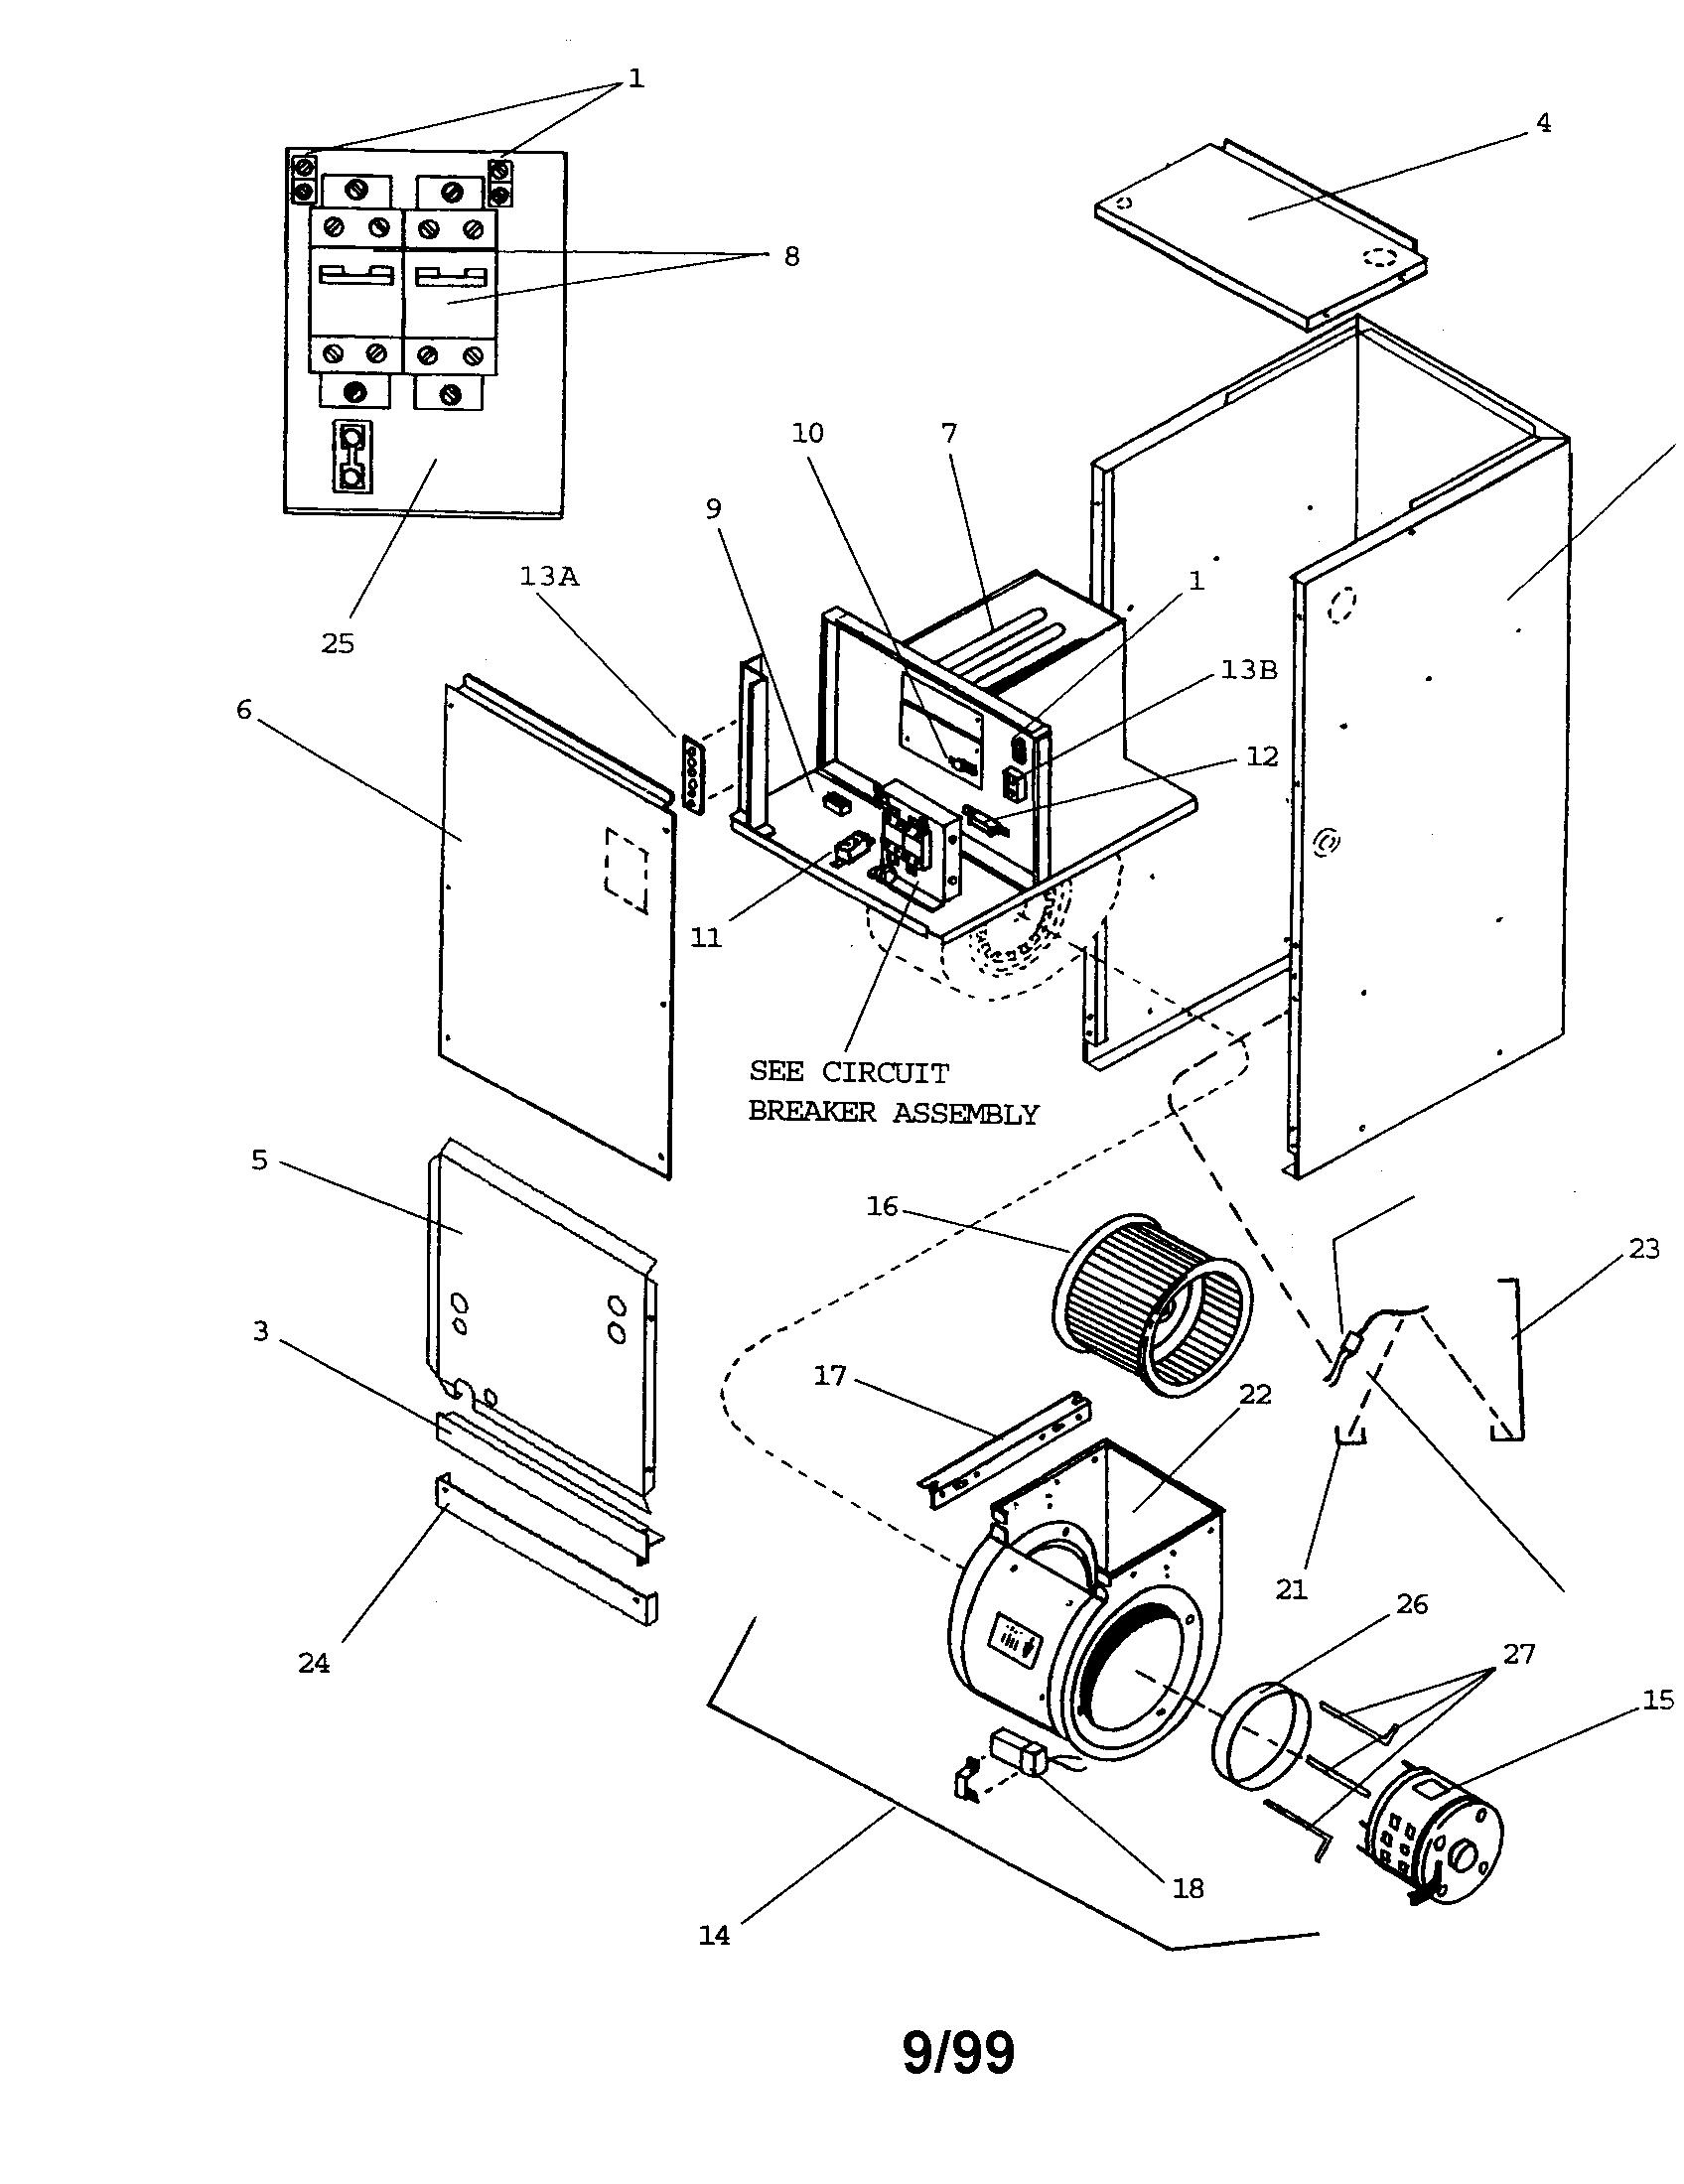 Goodman model A48-20 air handler (indoor blower&evap